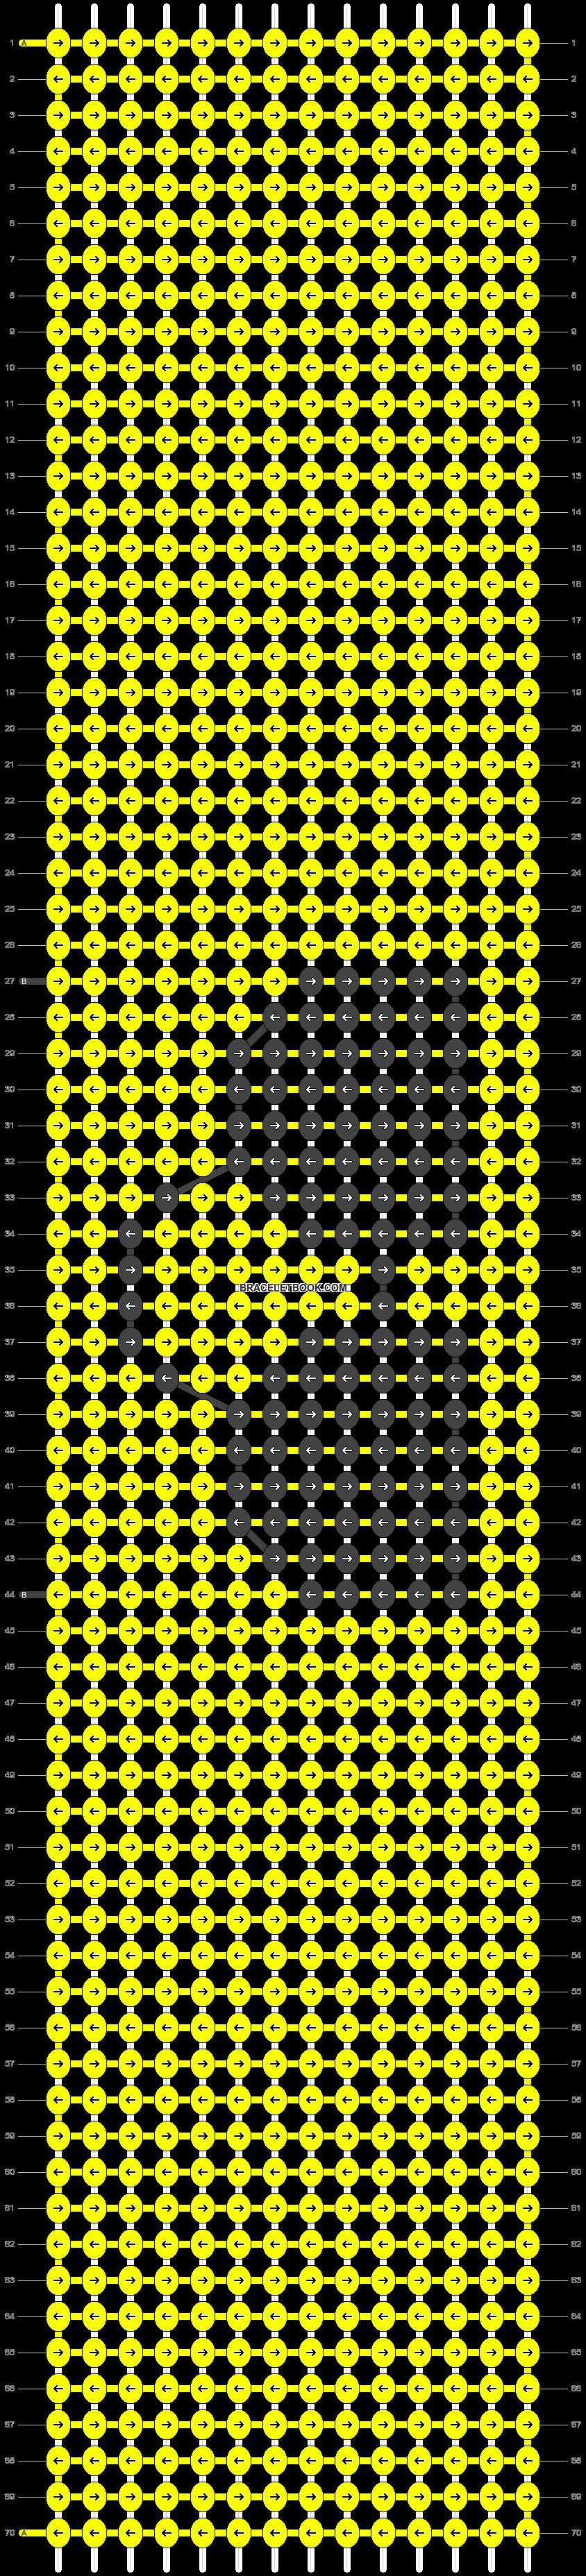 Alpha pattern #93319 pattern